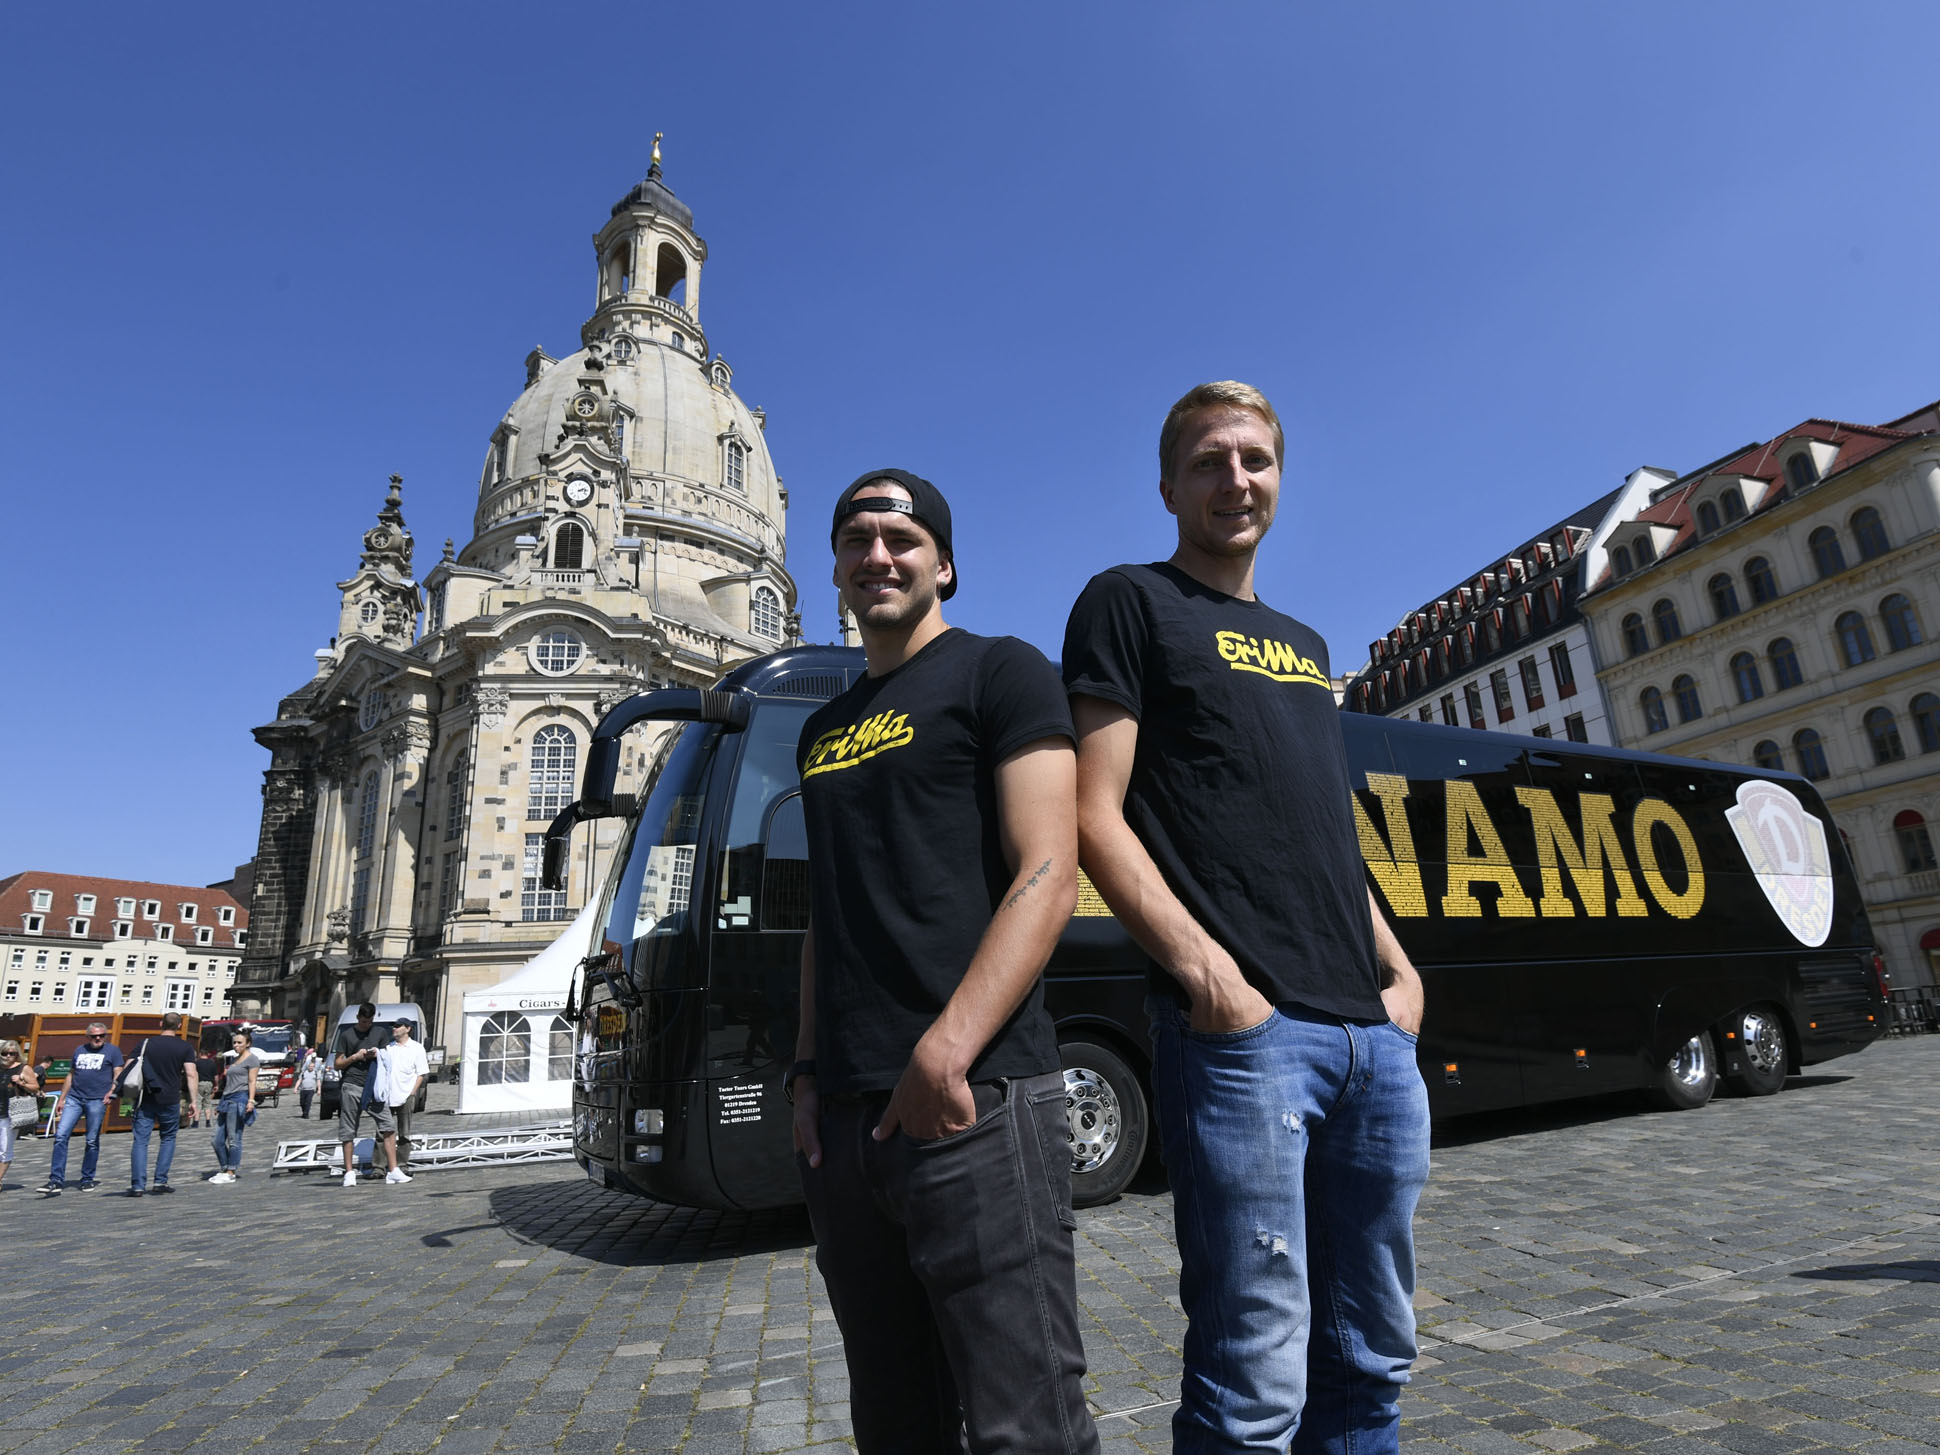 Pascal Testroet, Stürmer bei Dynamo Dresden, und Marco Hartmann, Mannschaftskapitän Dynamo Dresden, freuen sich über den neuen Mannschaftsbus, einen MAN Lion's Coach.